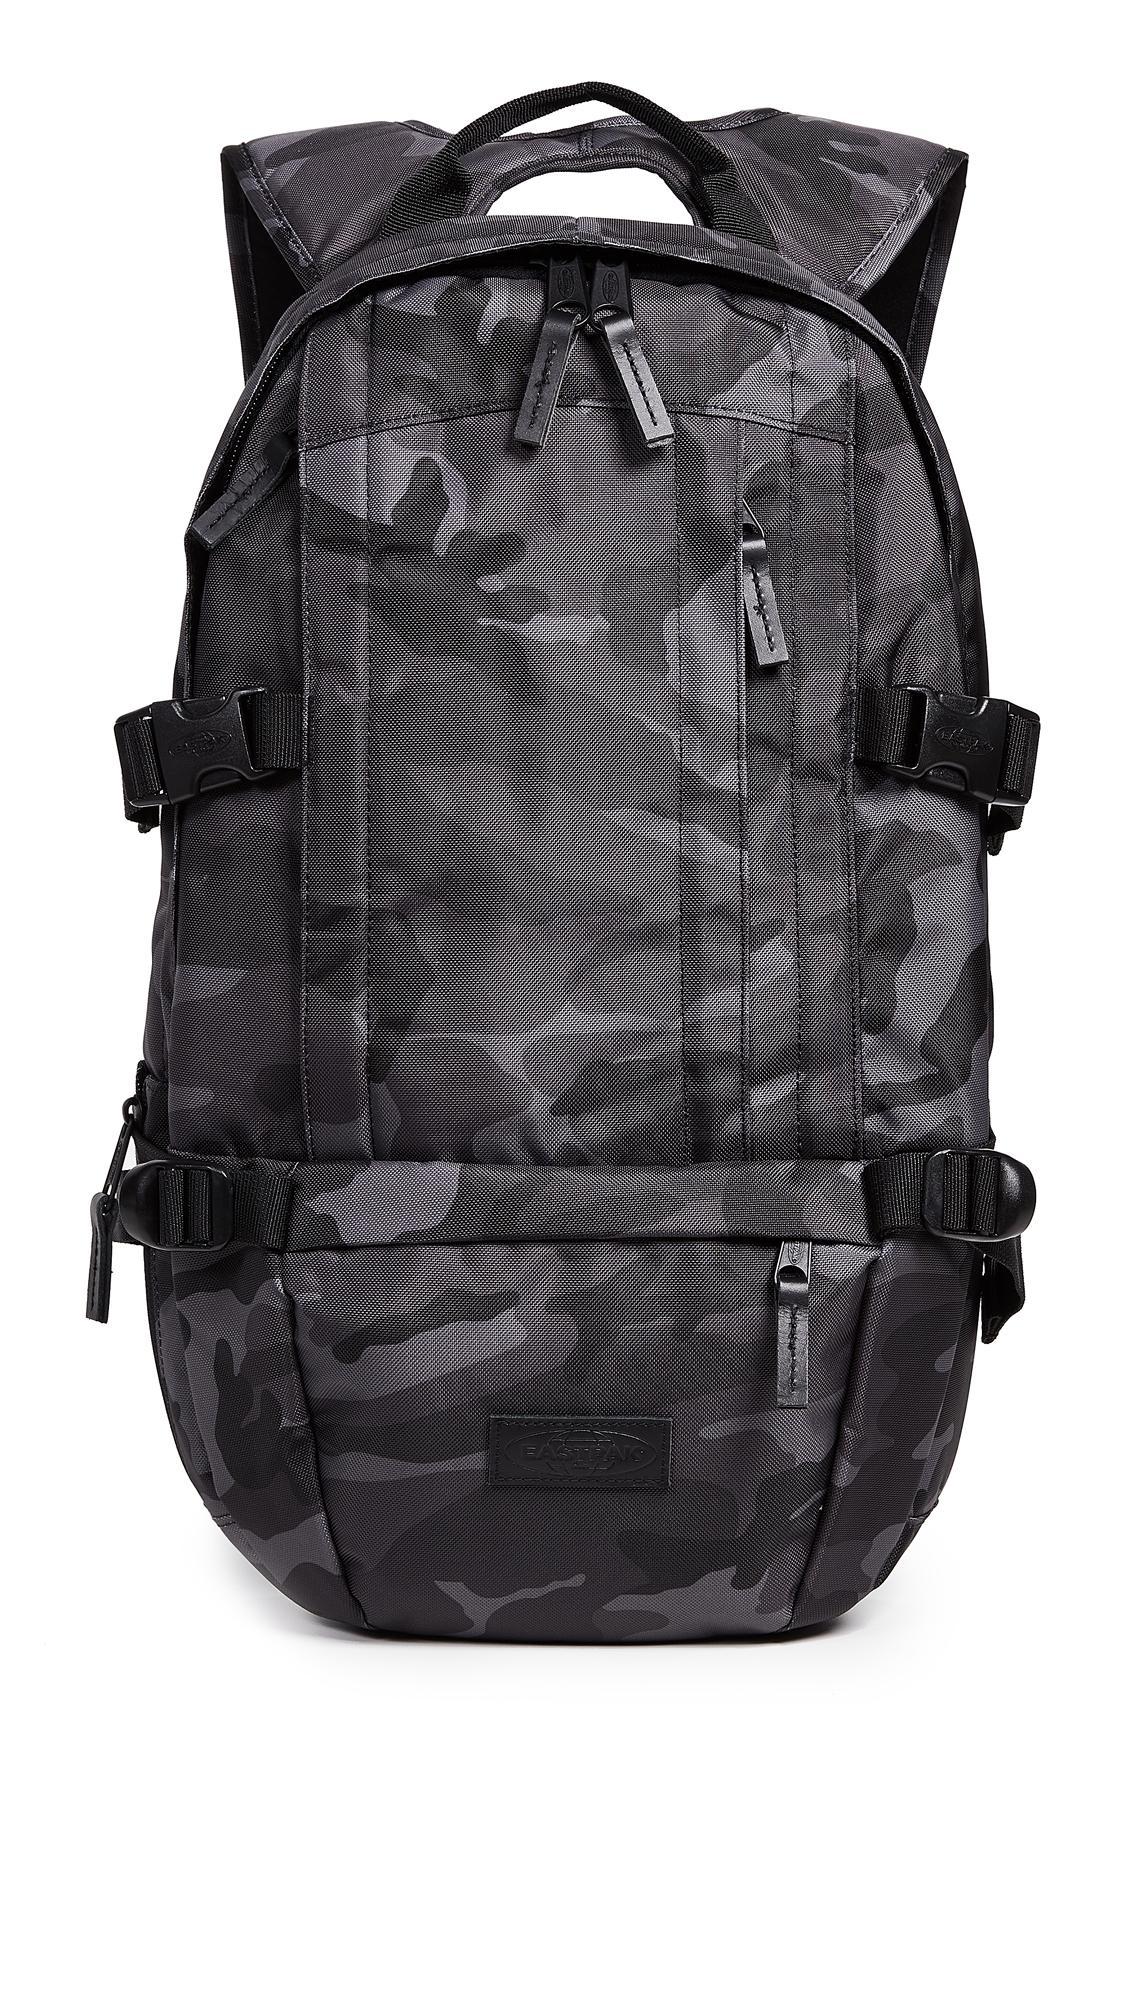 ba12547e79f Eastpak Floid Backpack In Constructed Camo | ModeSens